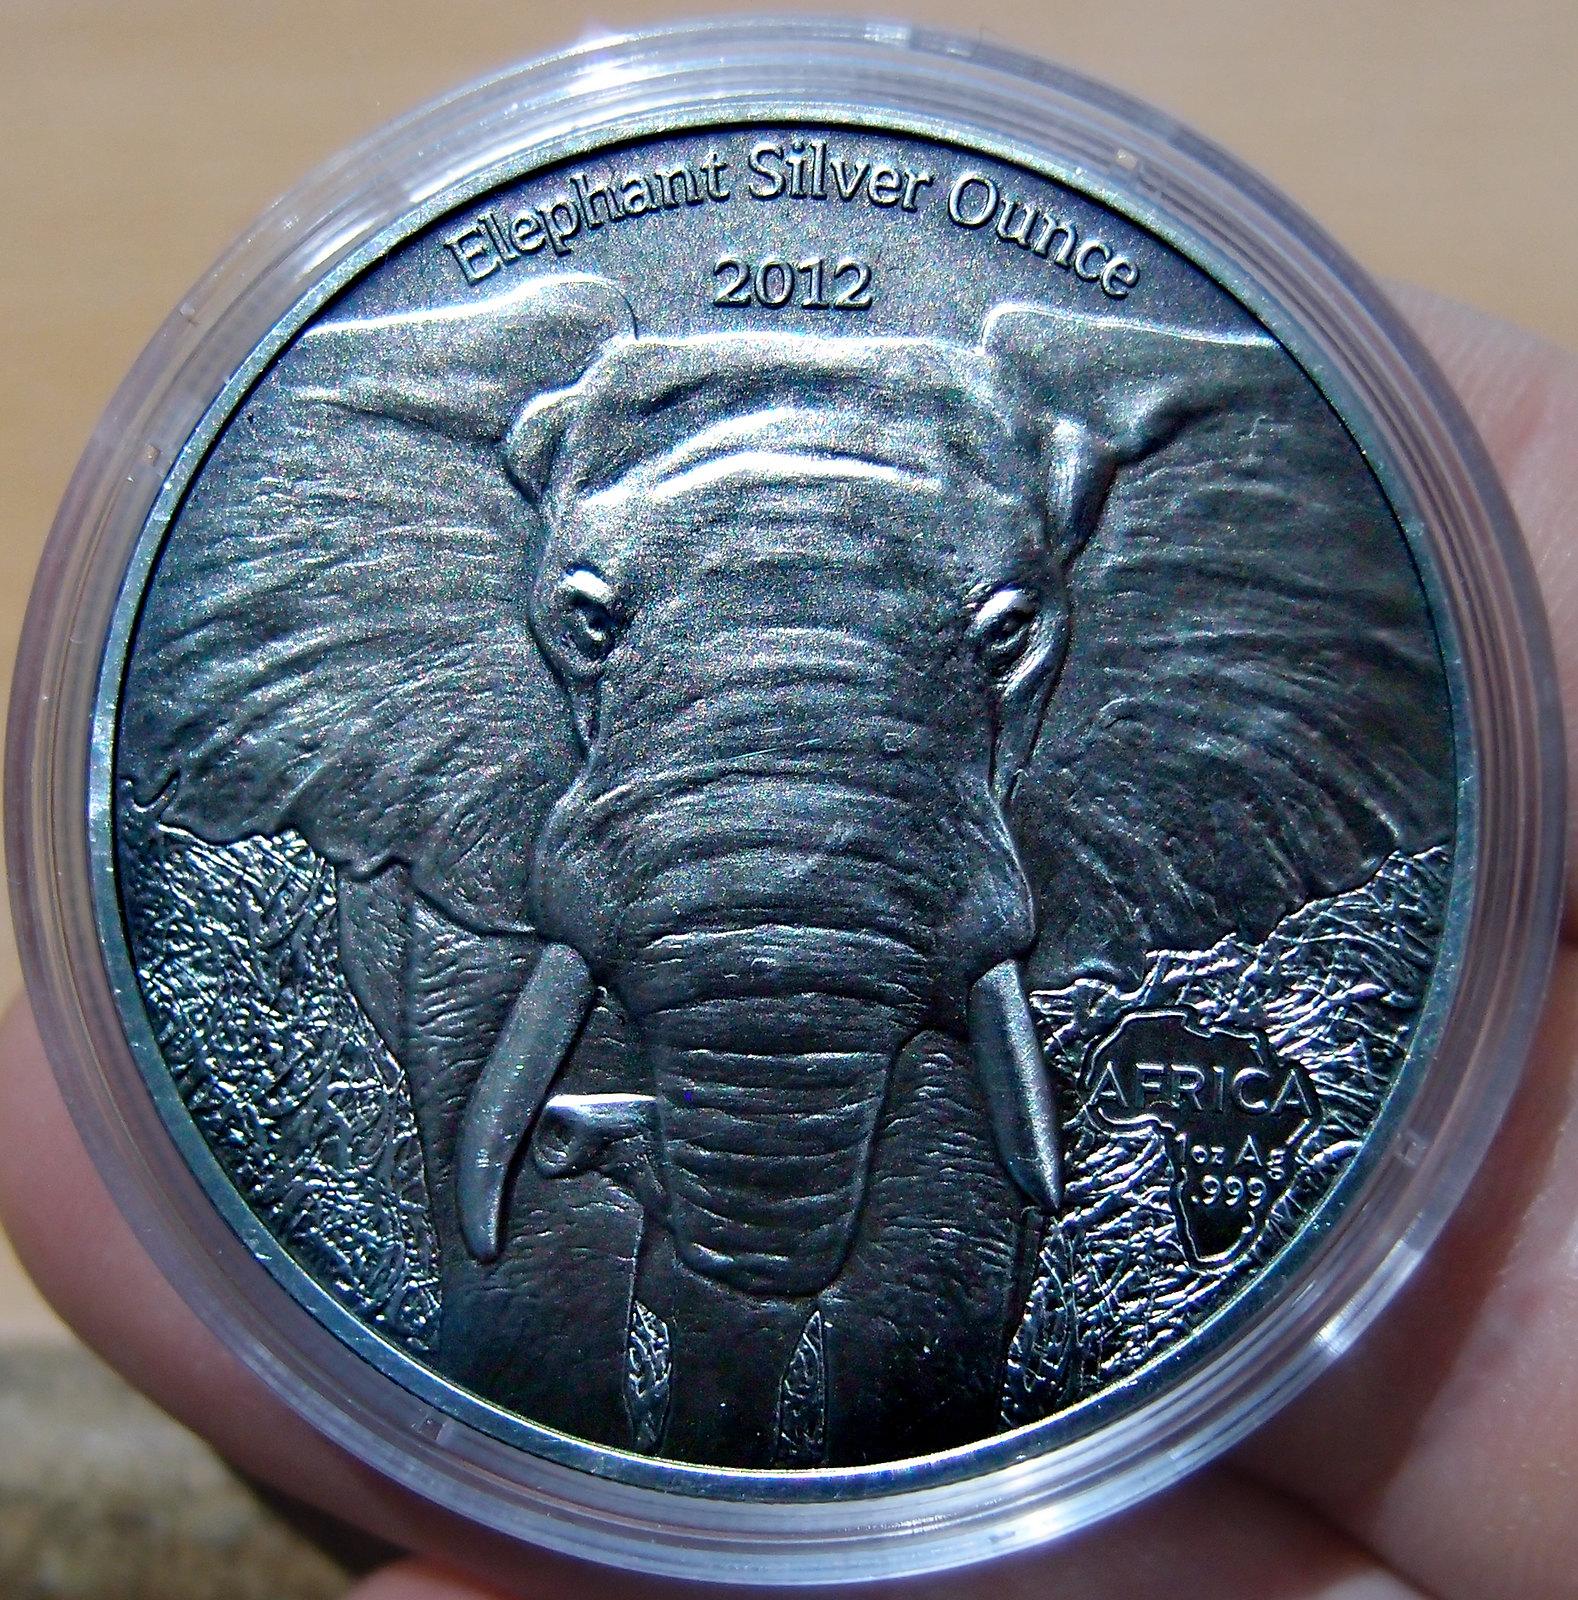 African Silver Ounce Serie  10025258456_c8b498d8a6_h